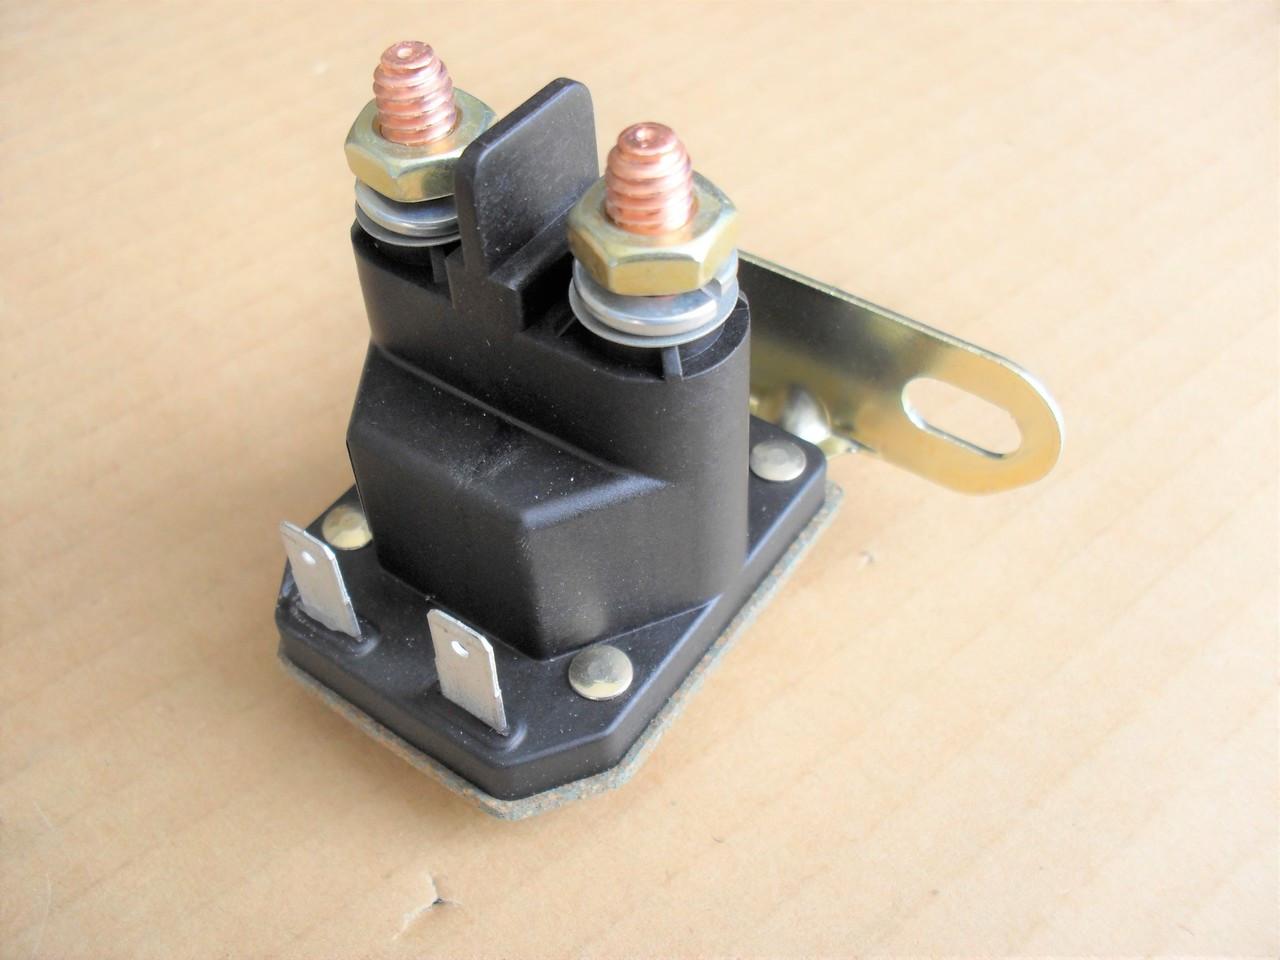 Starter Solenoid For Cub Cadet 725-04439 LTX1045 LTX1046 LT1042 LT1045 LT1040